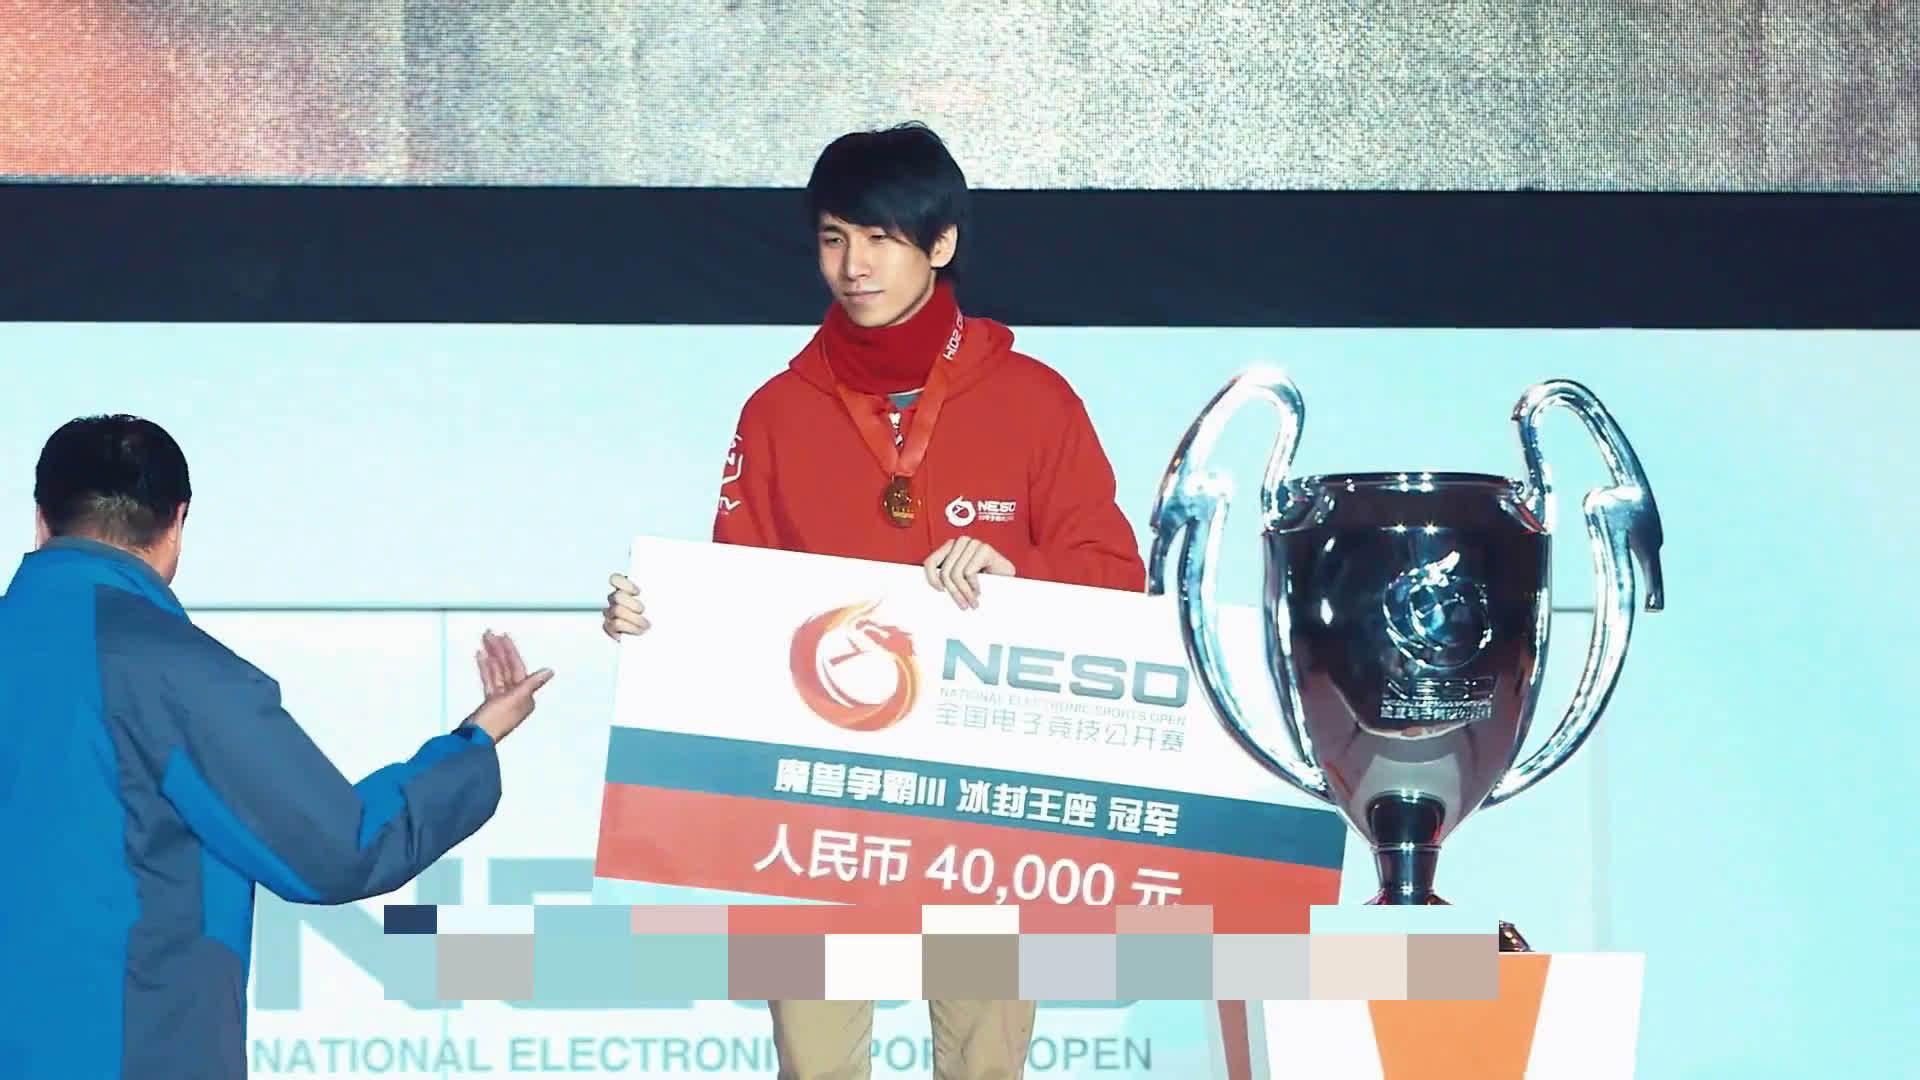 TH000在八月公开组决赛前下预测:Yumiko一定拿季军